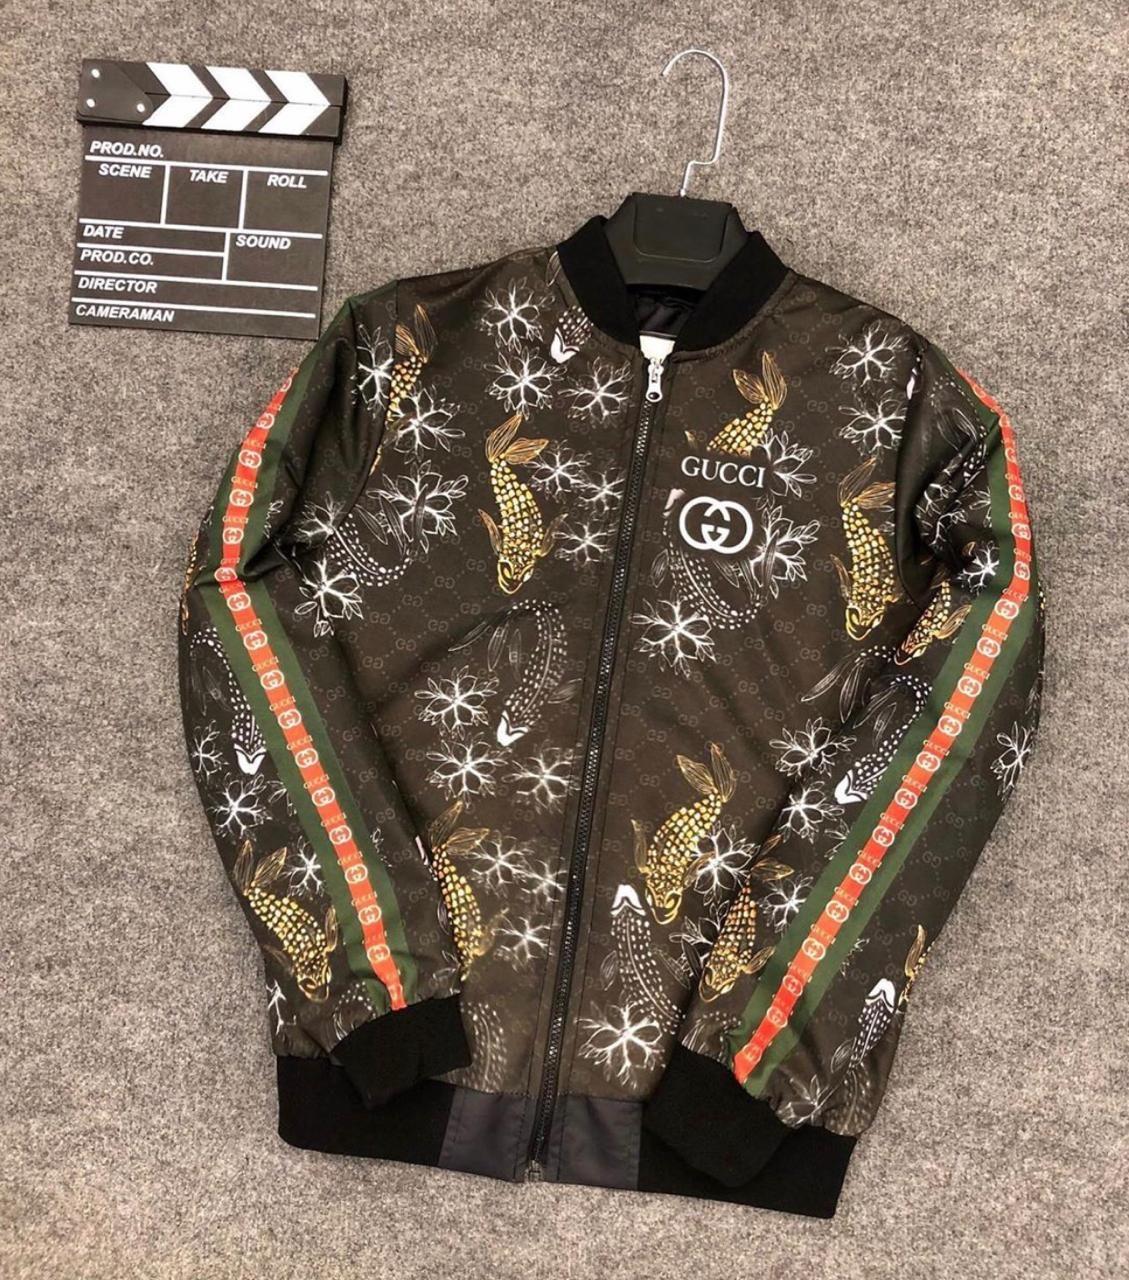 Pin By Harry Potter Market On All Men S Needs Fashion Mens Tops Varsity Jacket [ 1280 x 1129 Pixel ]